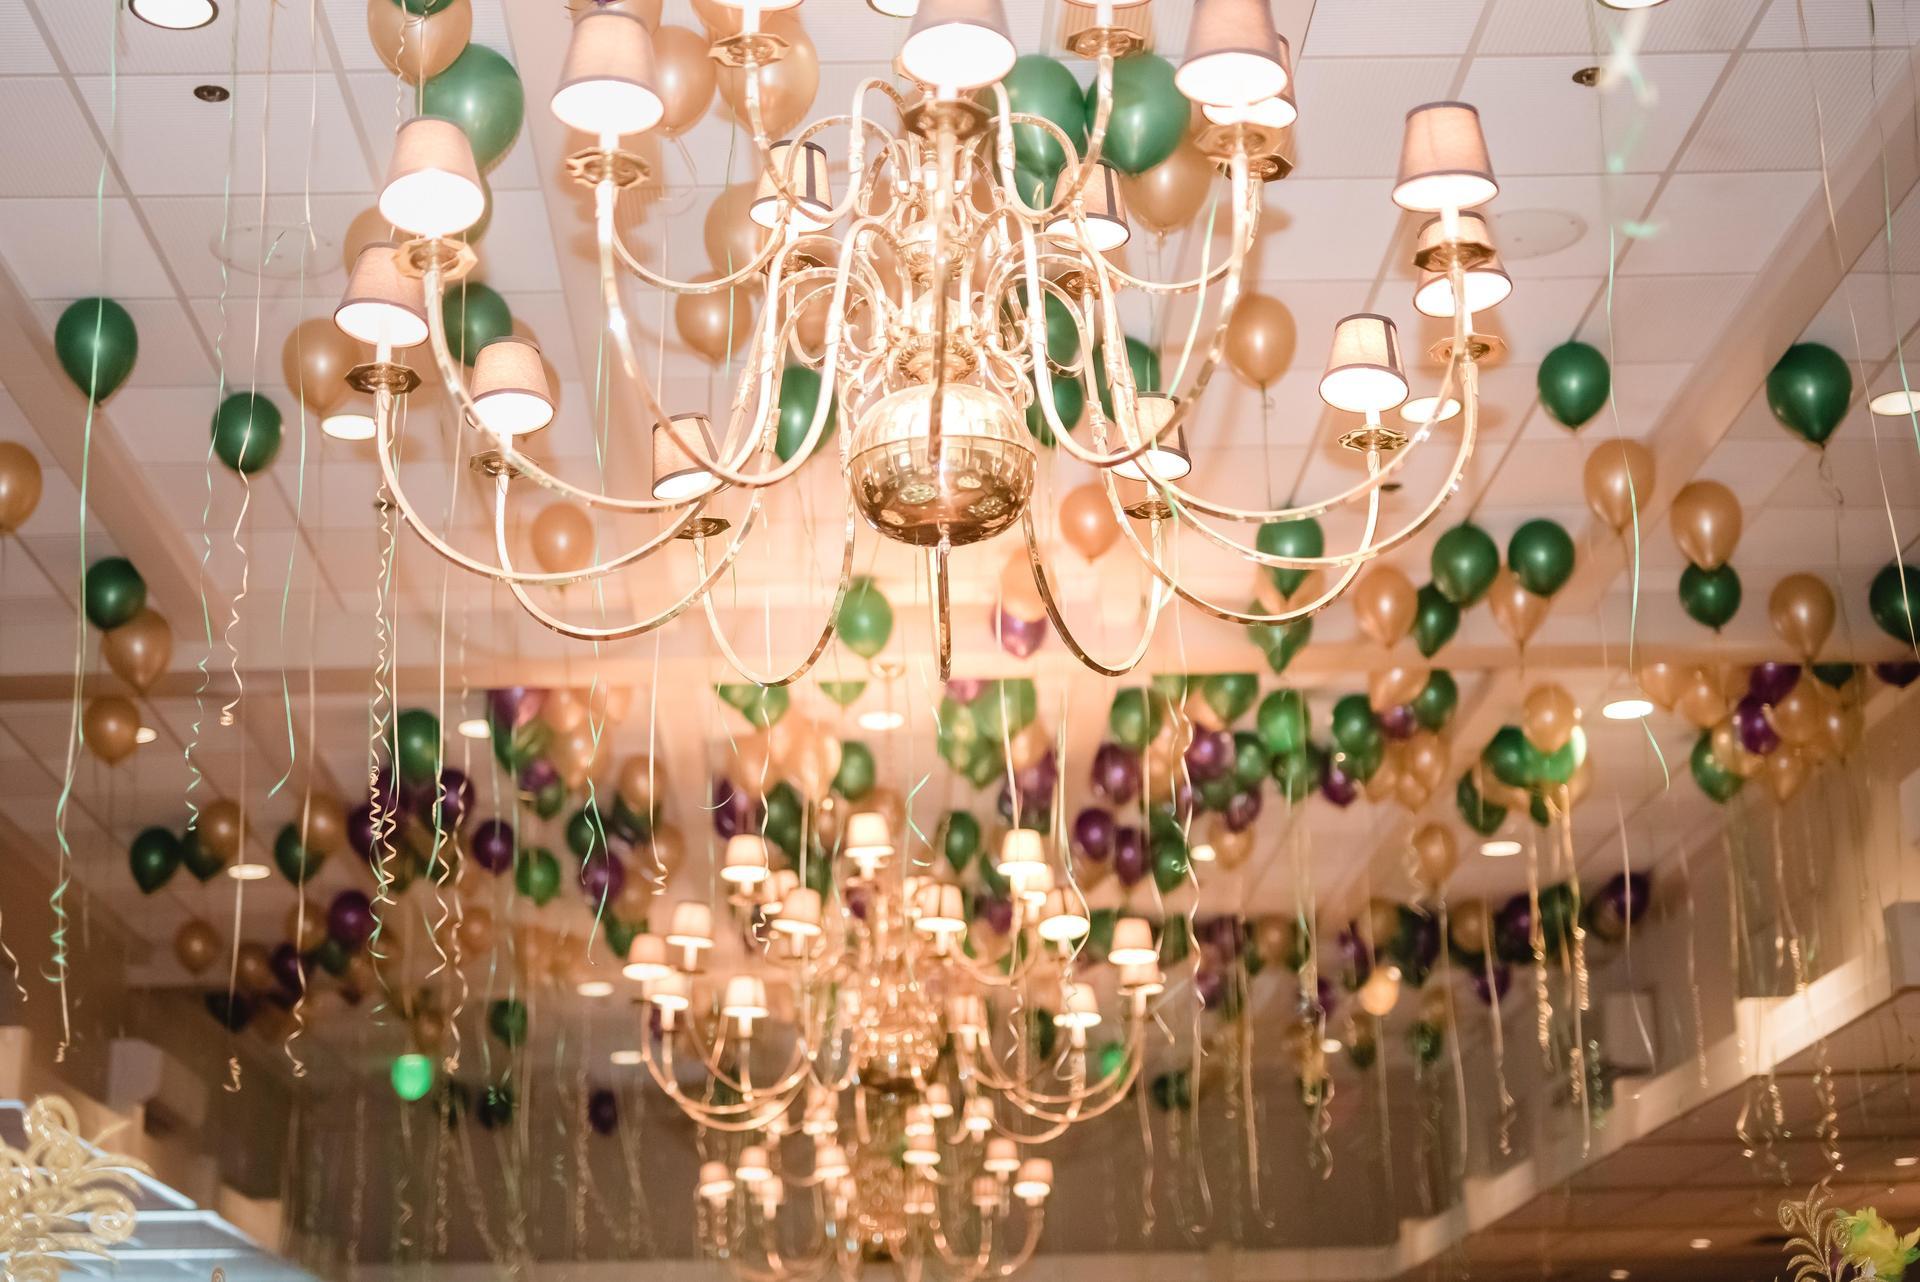 gala balloons